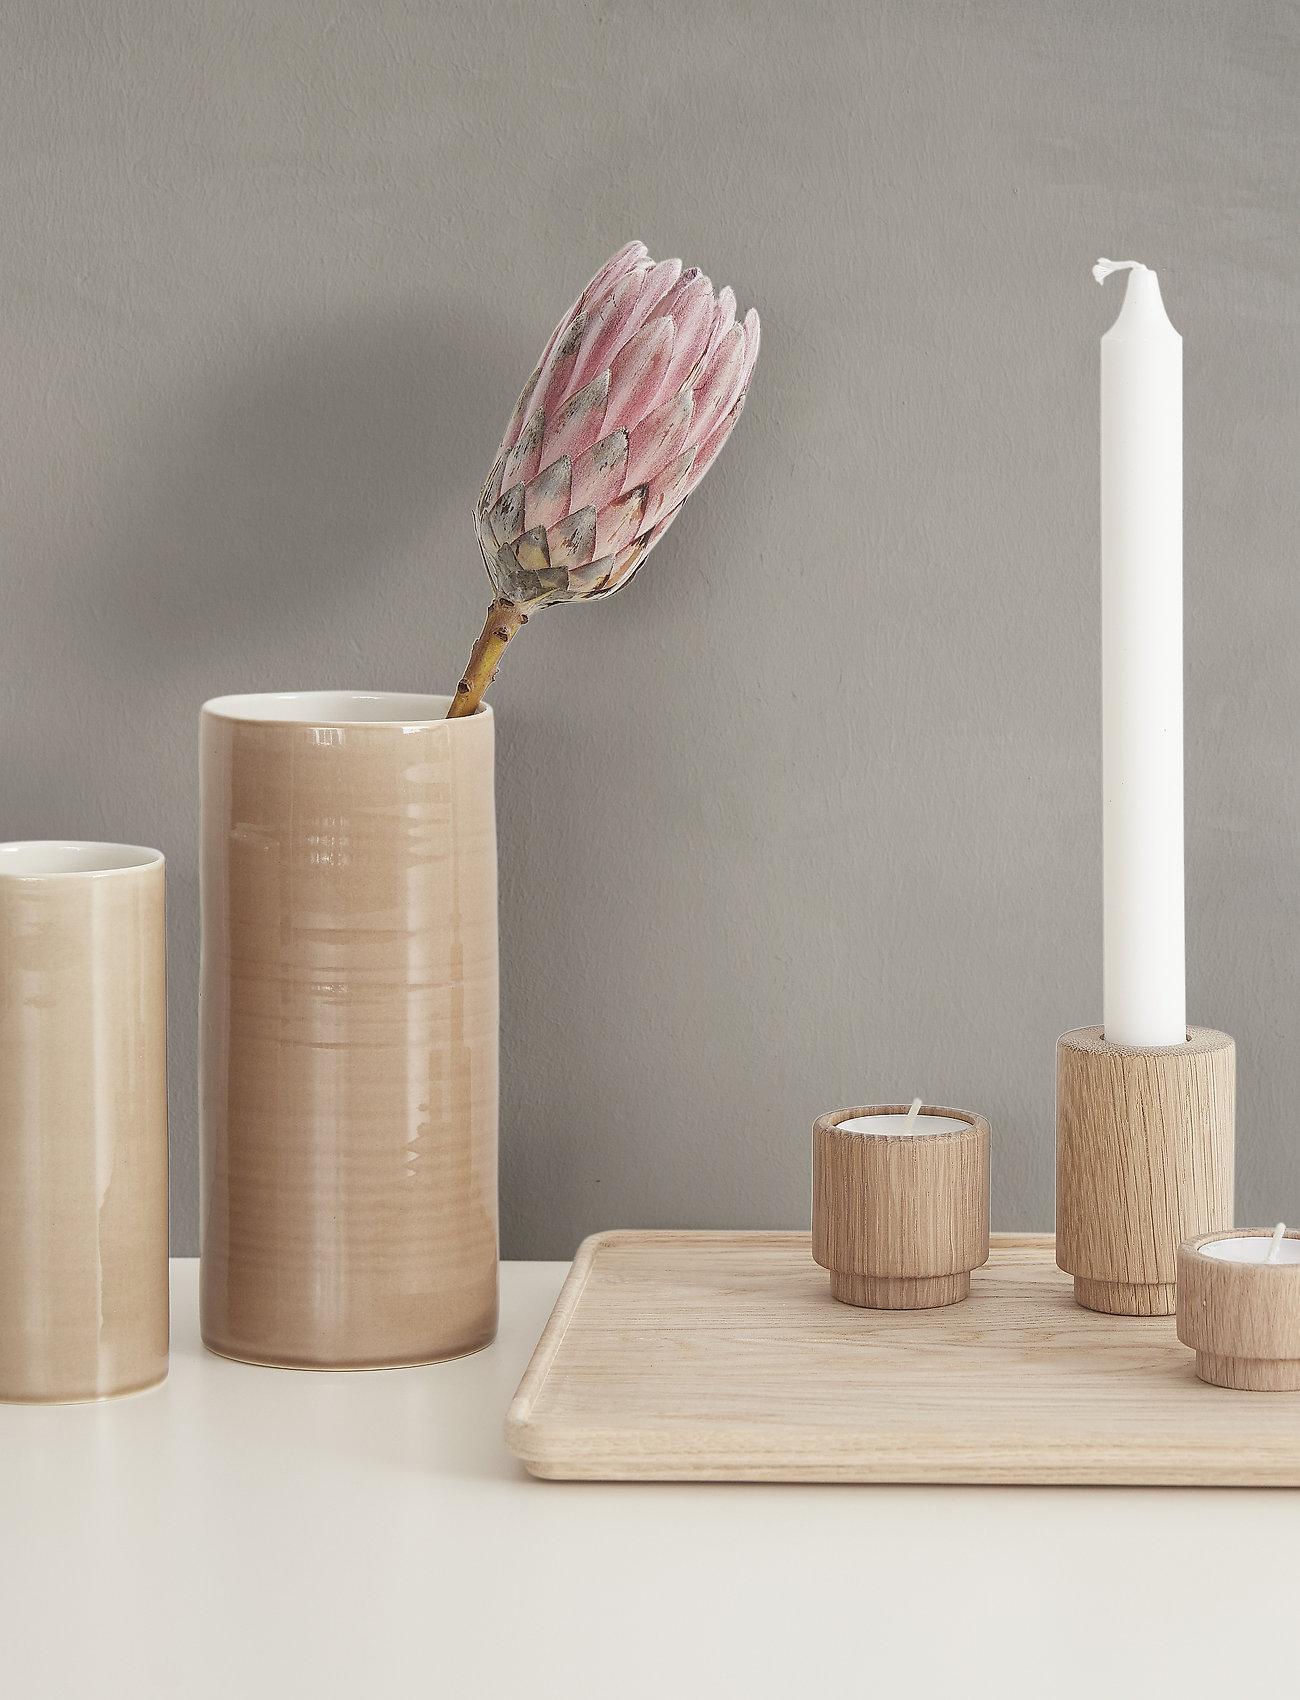 Andersen Furniture - Create me tea light - lyslykter - no color - 1